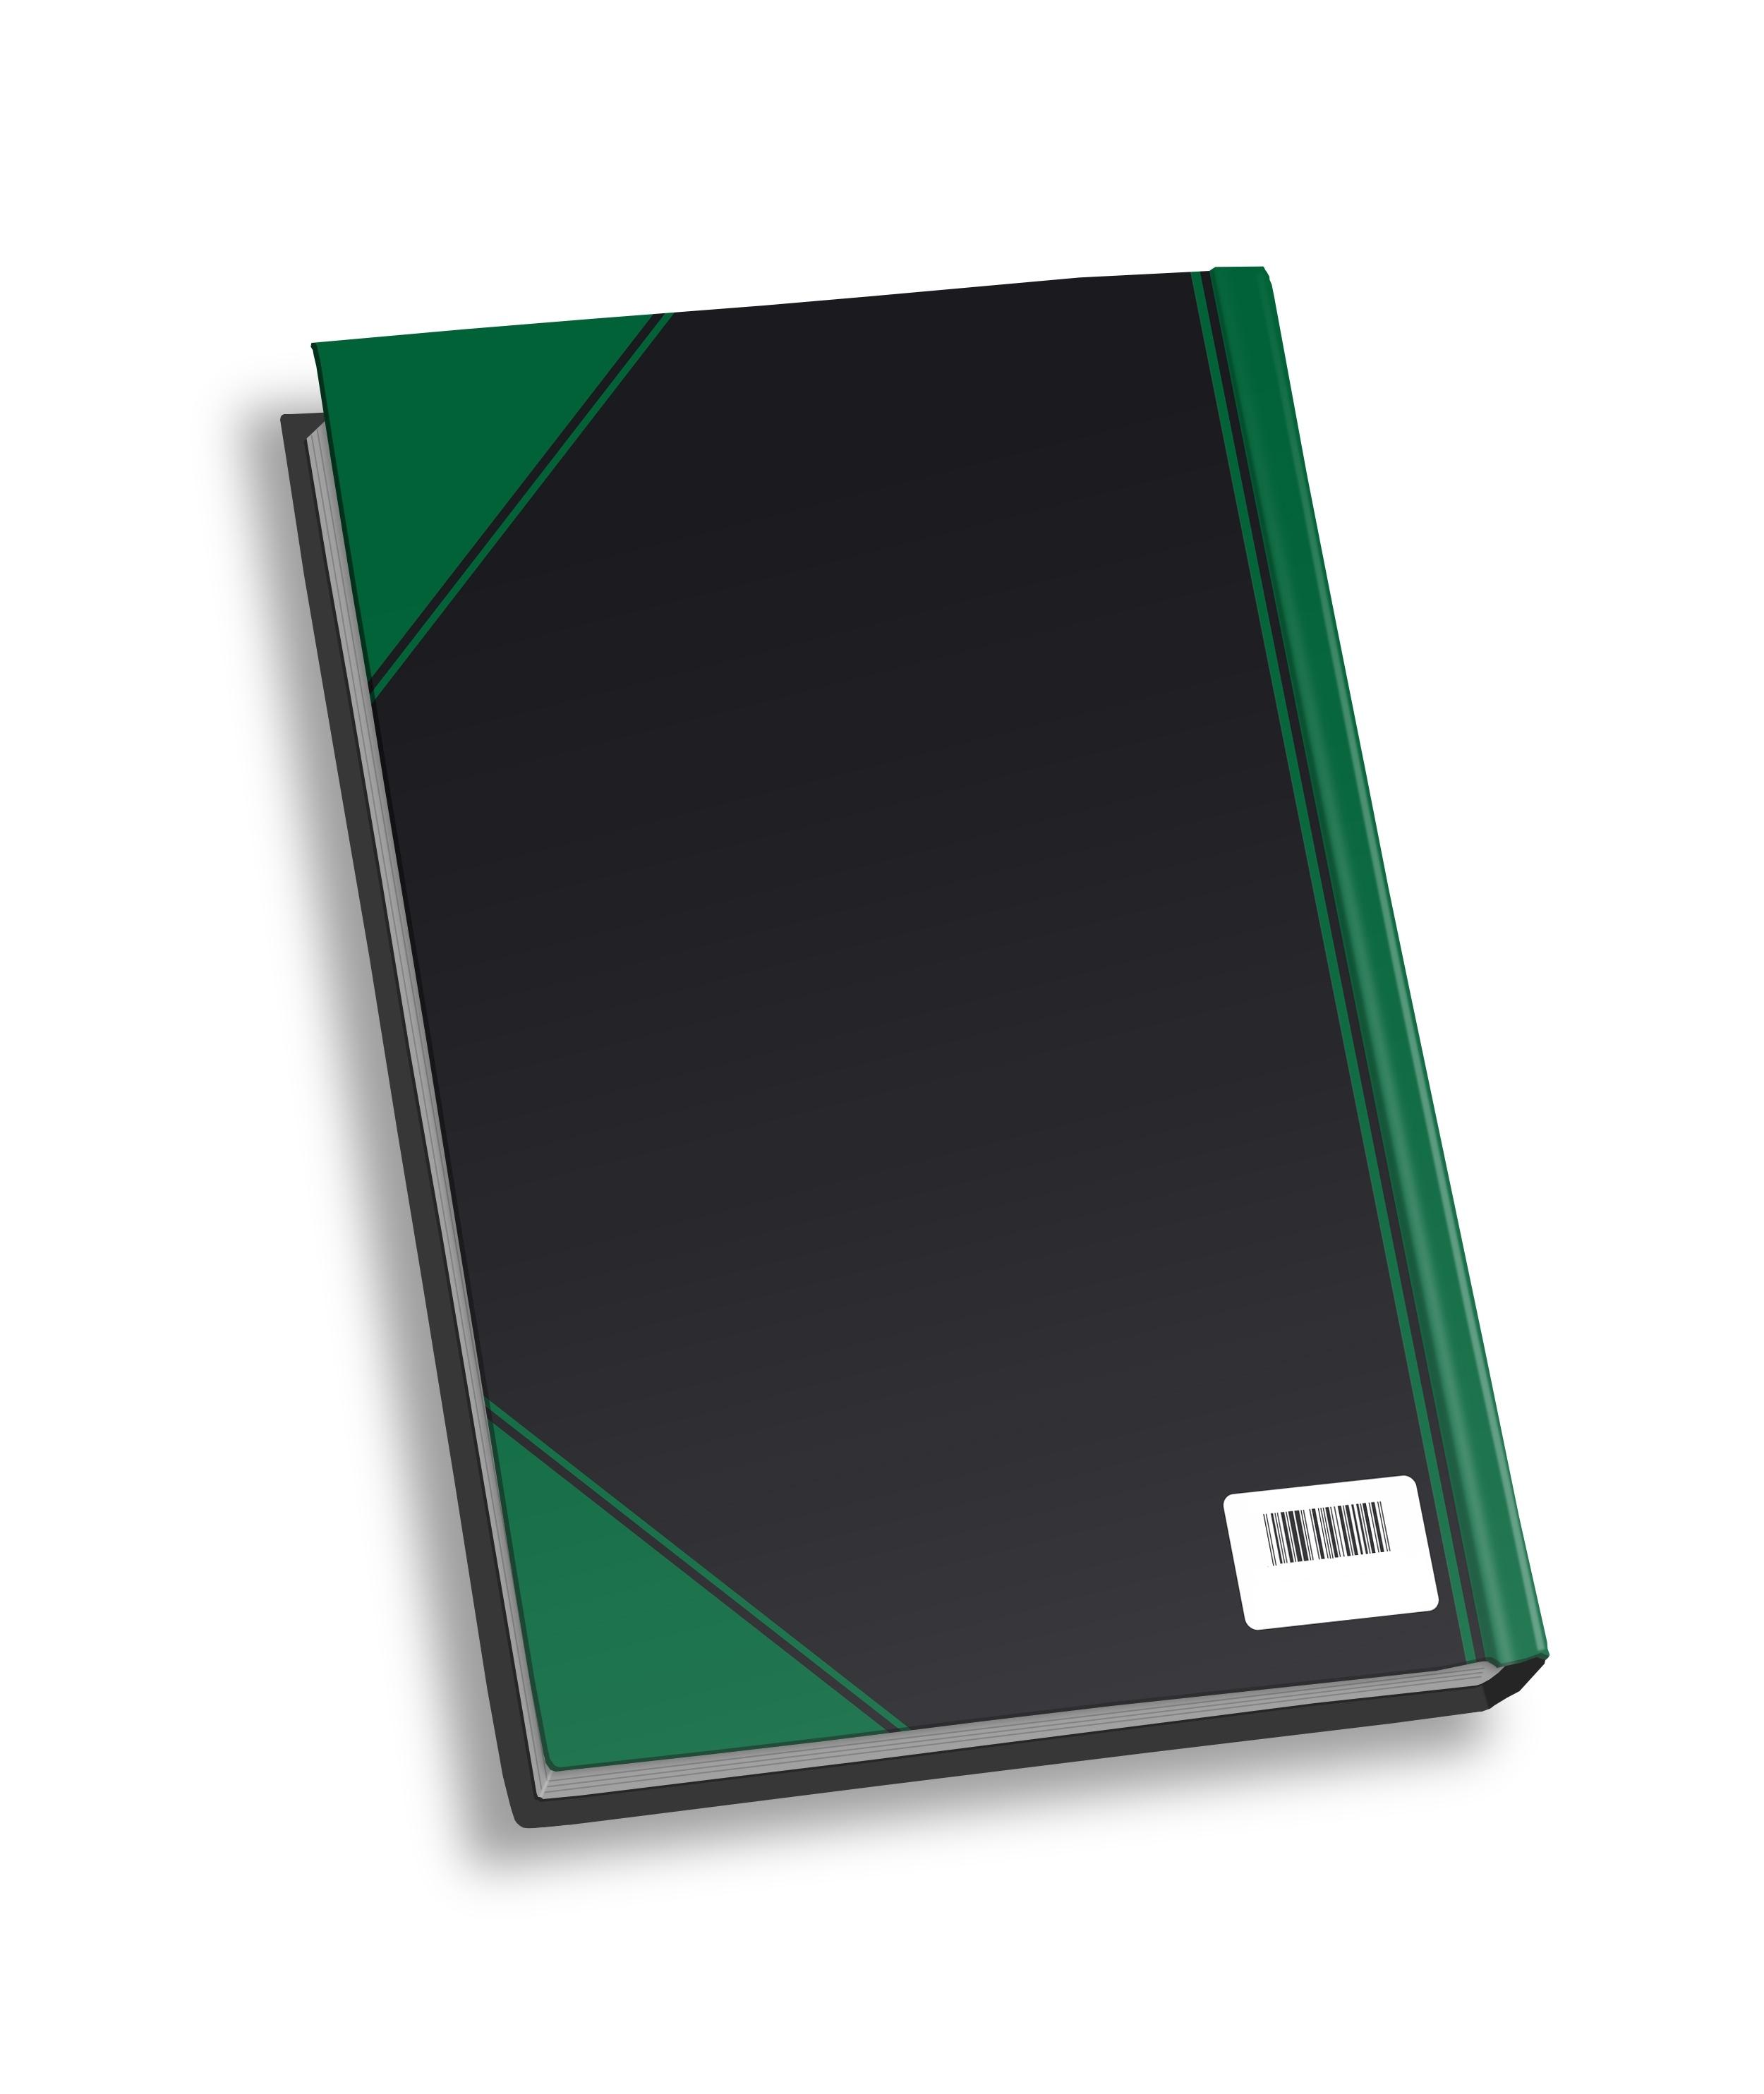 Notizbuch DIN A5 70g//m² 2 verschiedene Motiv-Kladden liniert 80 Blatt